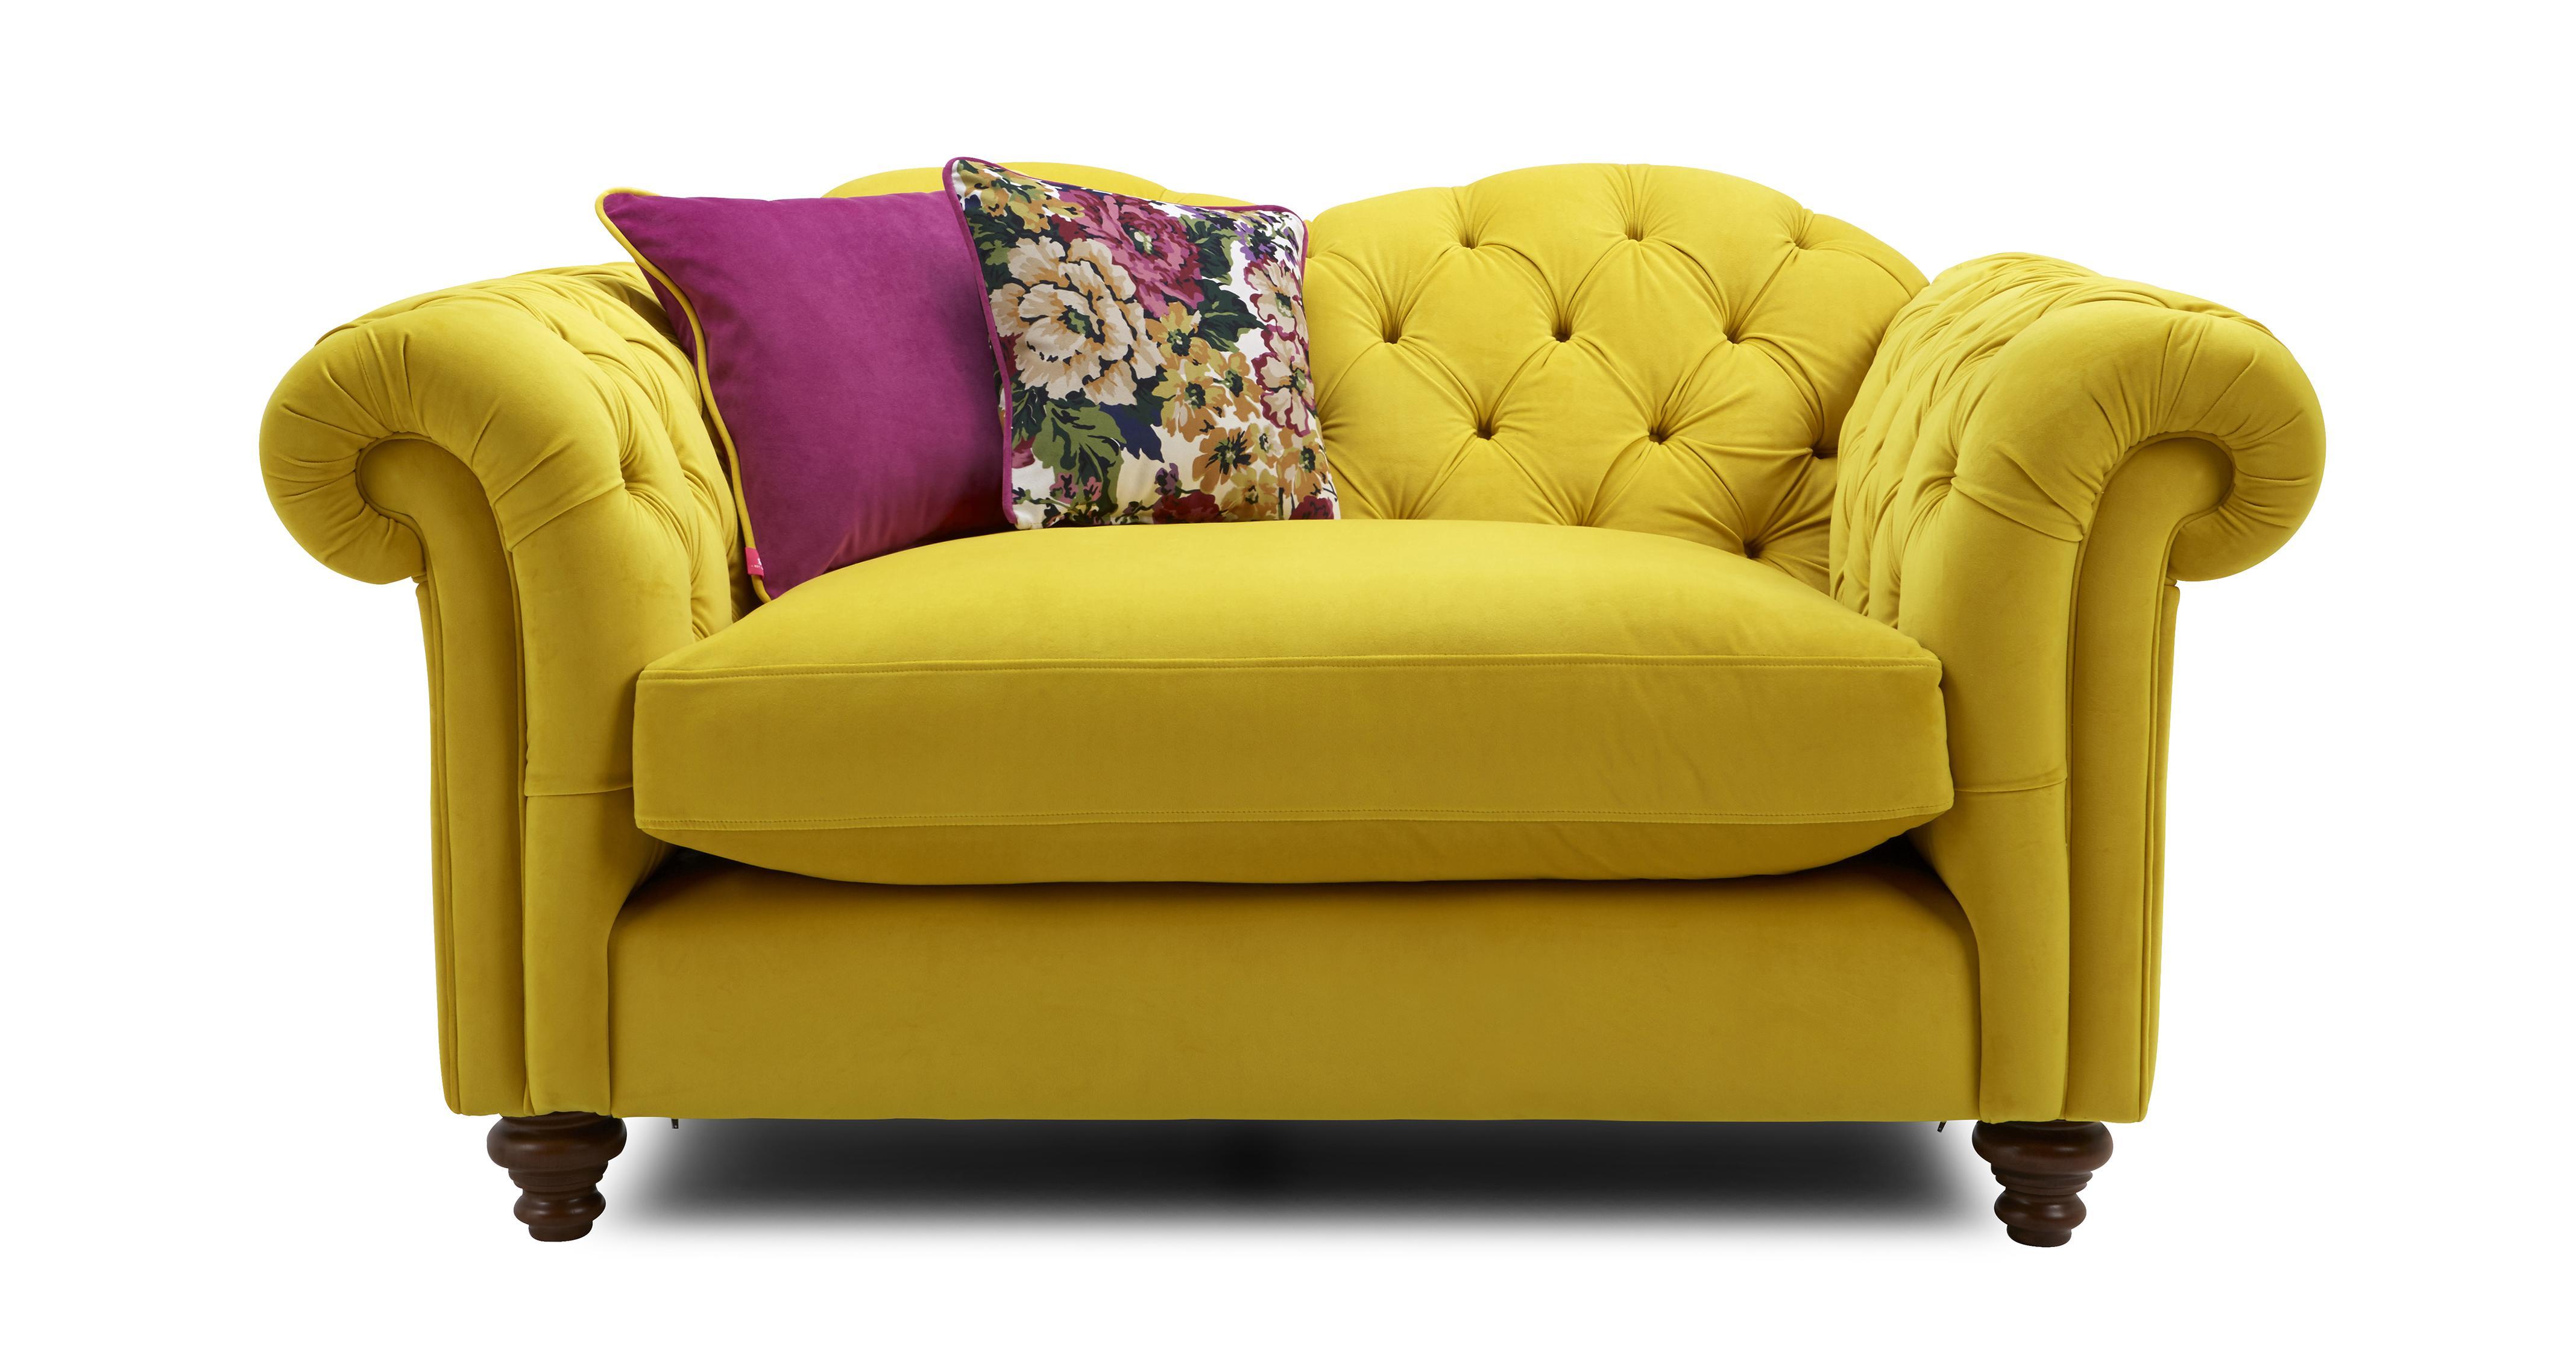 30 Model Kursi Sofa Minimalis Kayu Tamu Beserta Harga